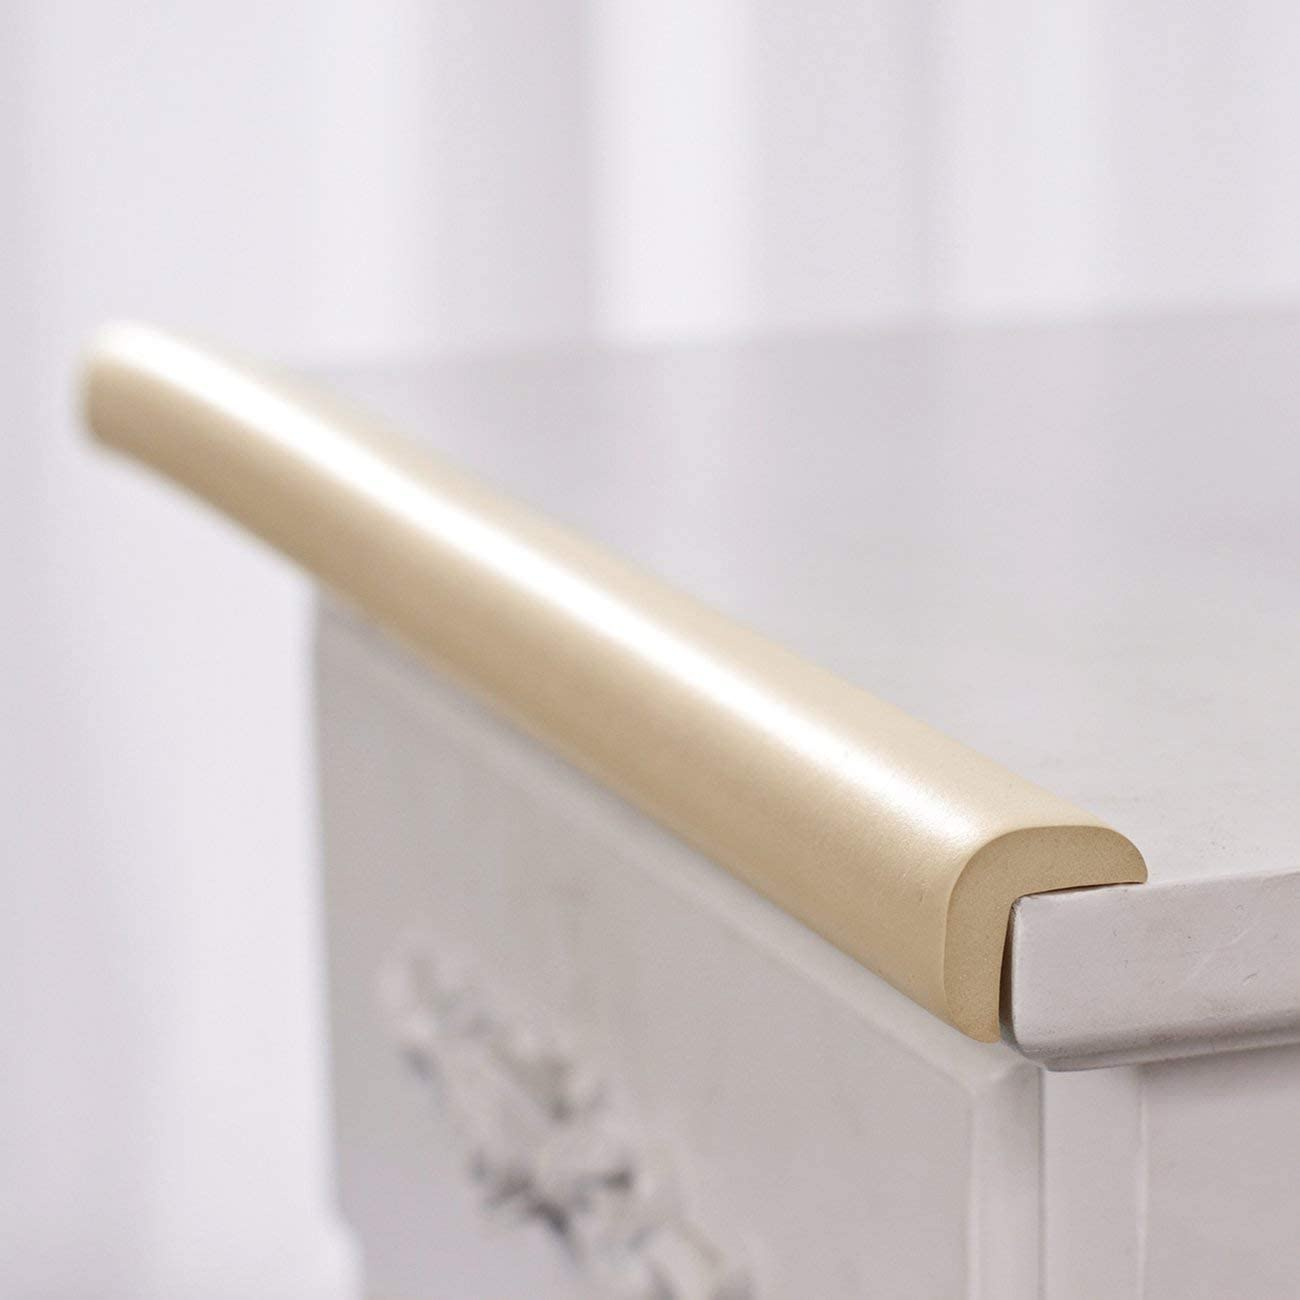 FayOK 78.7 inch Baby L Shape Safety Bumper Strip Table Desk Edge Corner Cushion Guard Strip